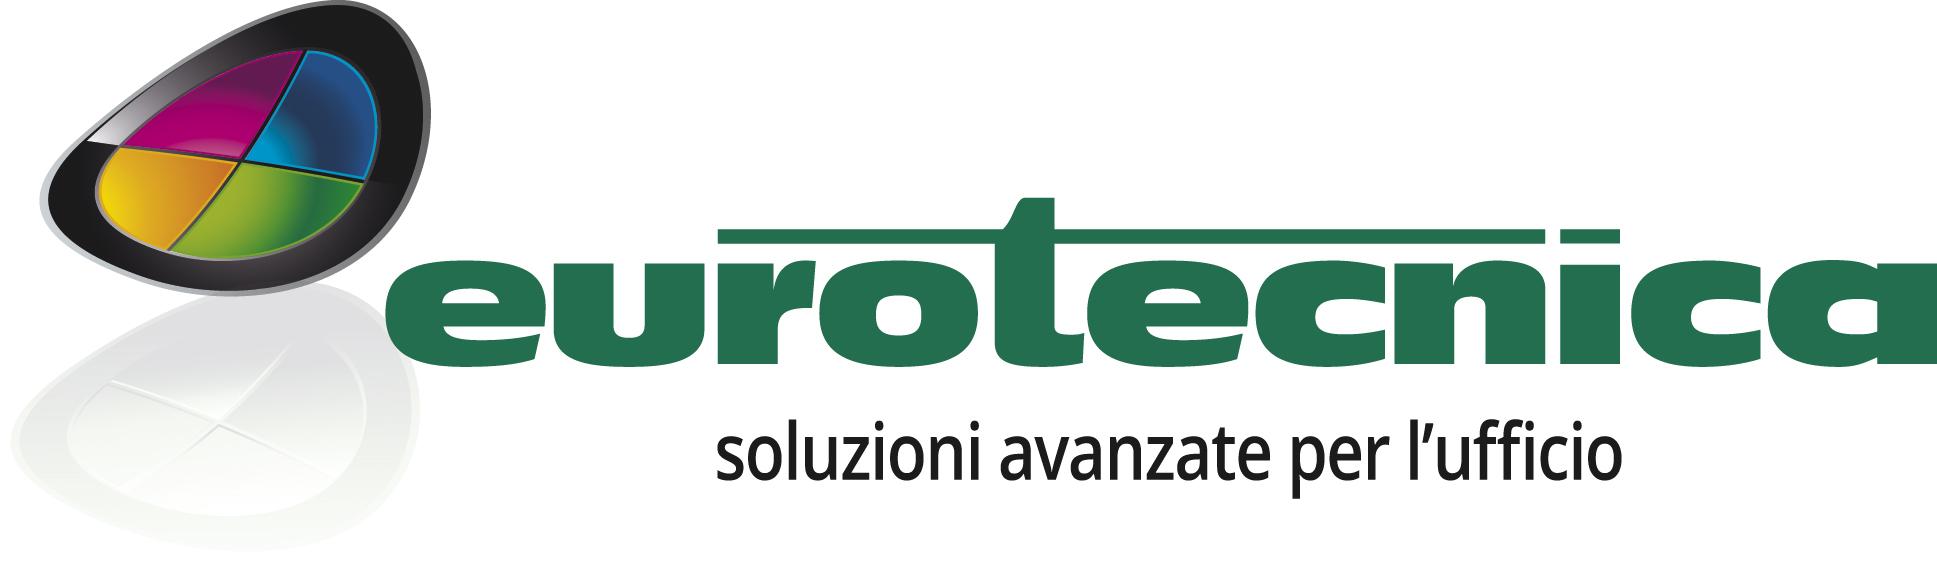 logo_eurotecnica-vr_rgb.jpg